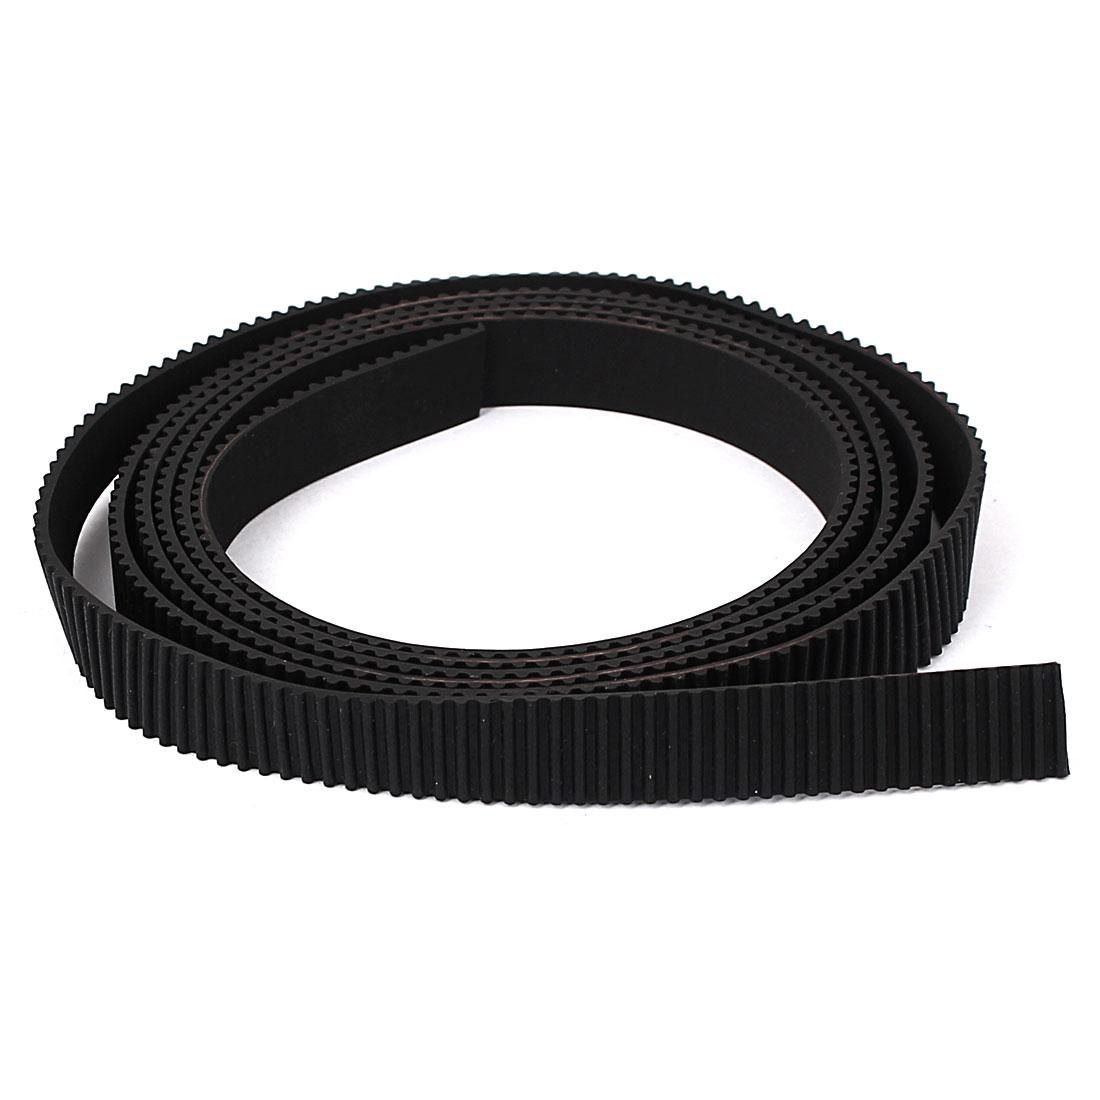 1 Meter Length Open Ended Rubber Timing Belt Black for 3D Printers